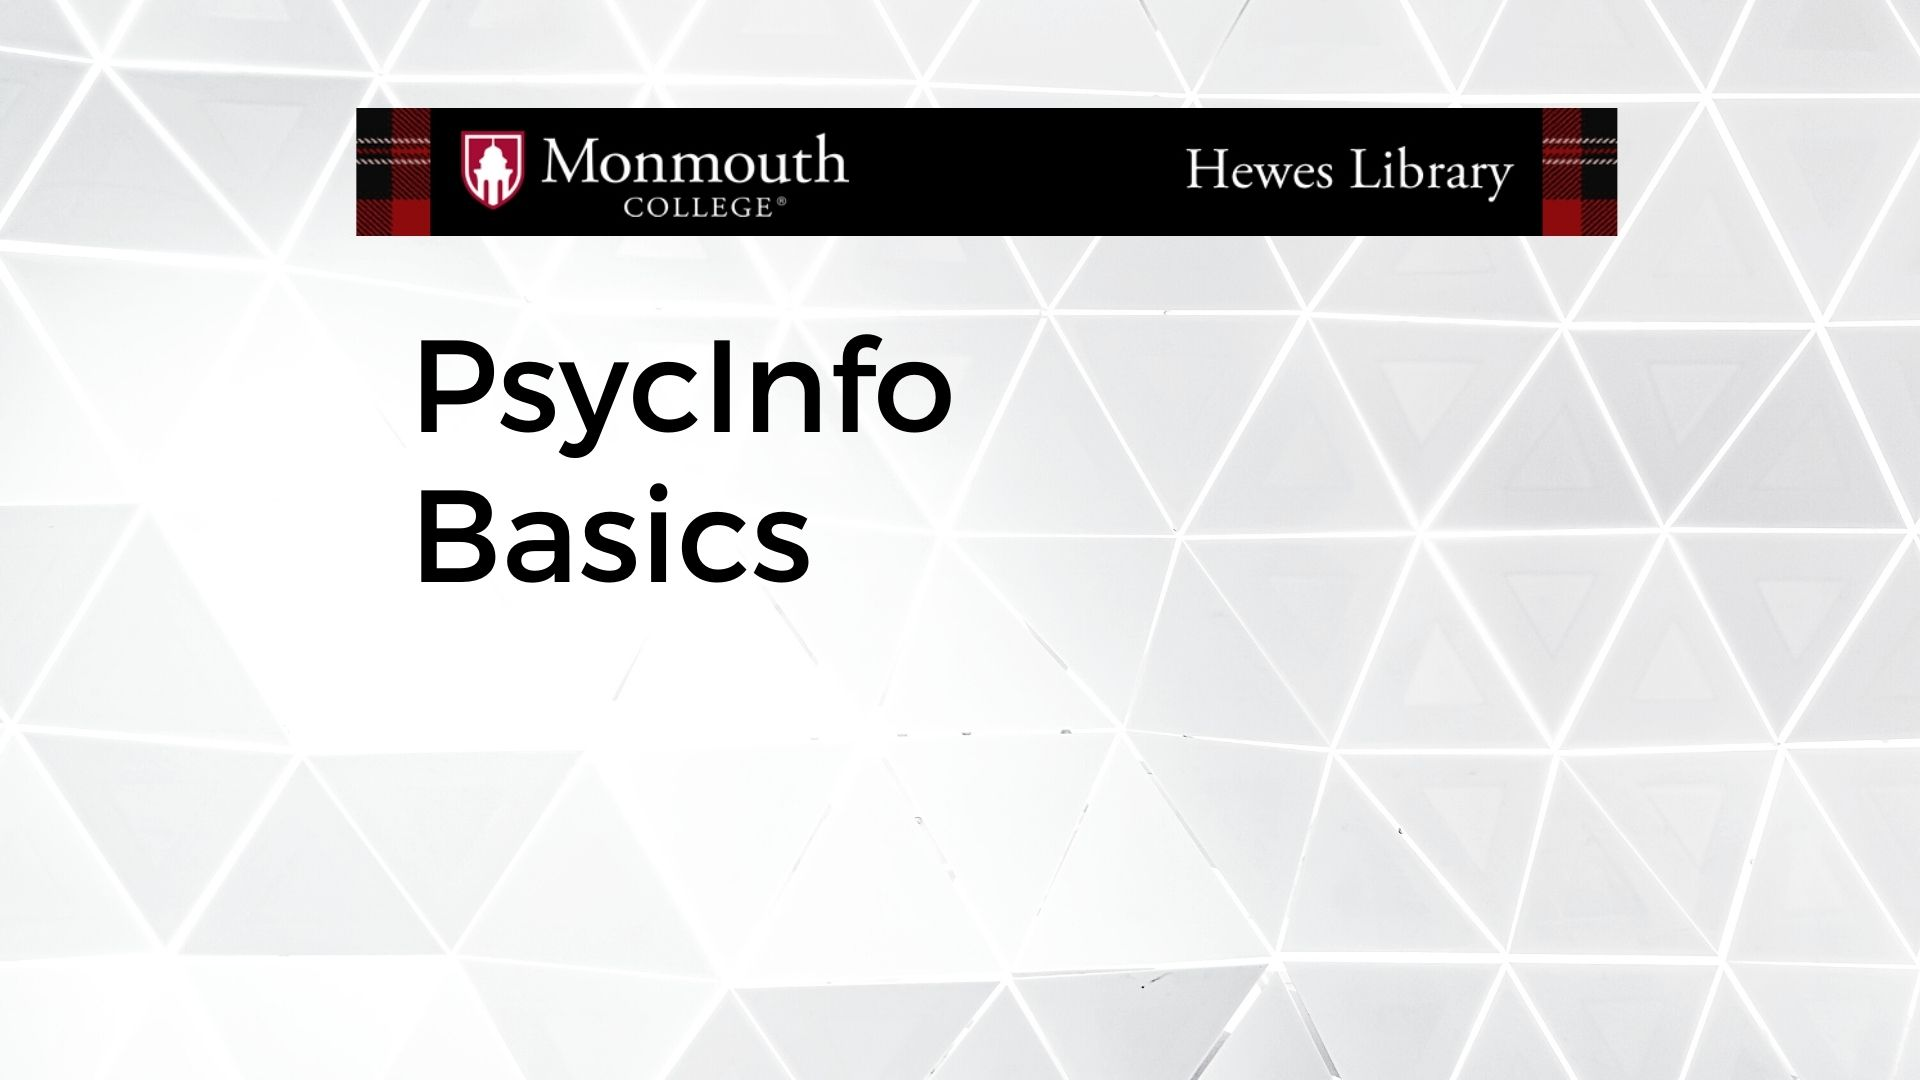 PsycInfo Basics